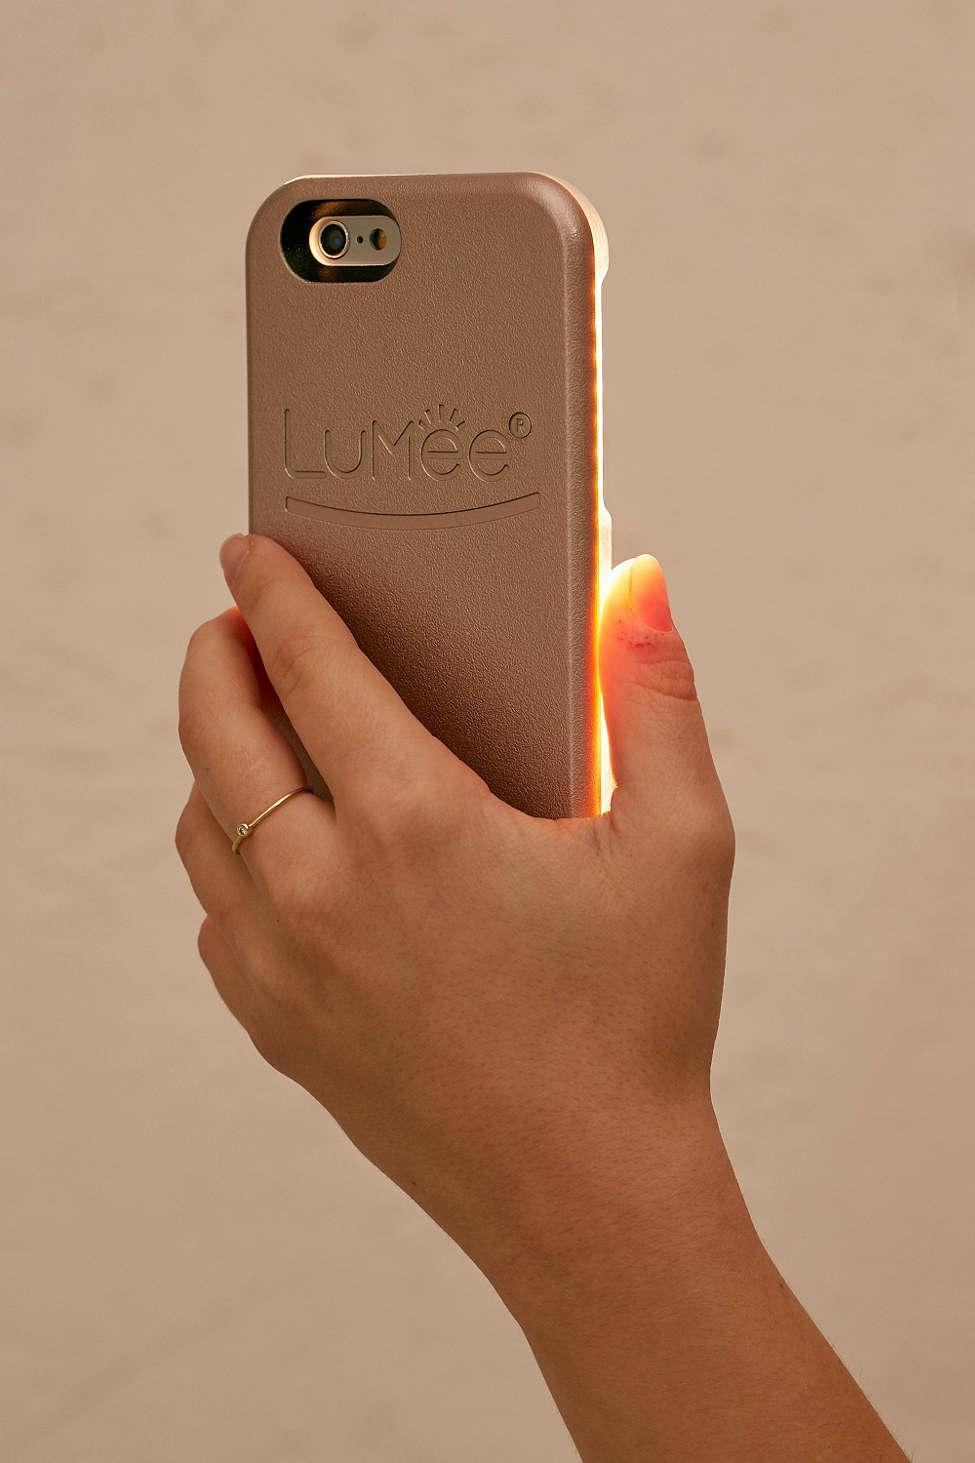 LuMee Perfect Selfie iPhone Case $55